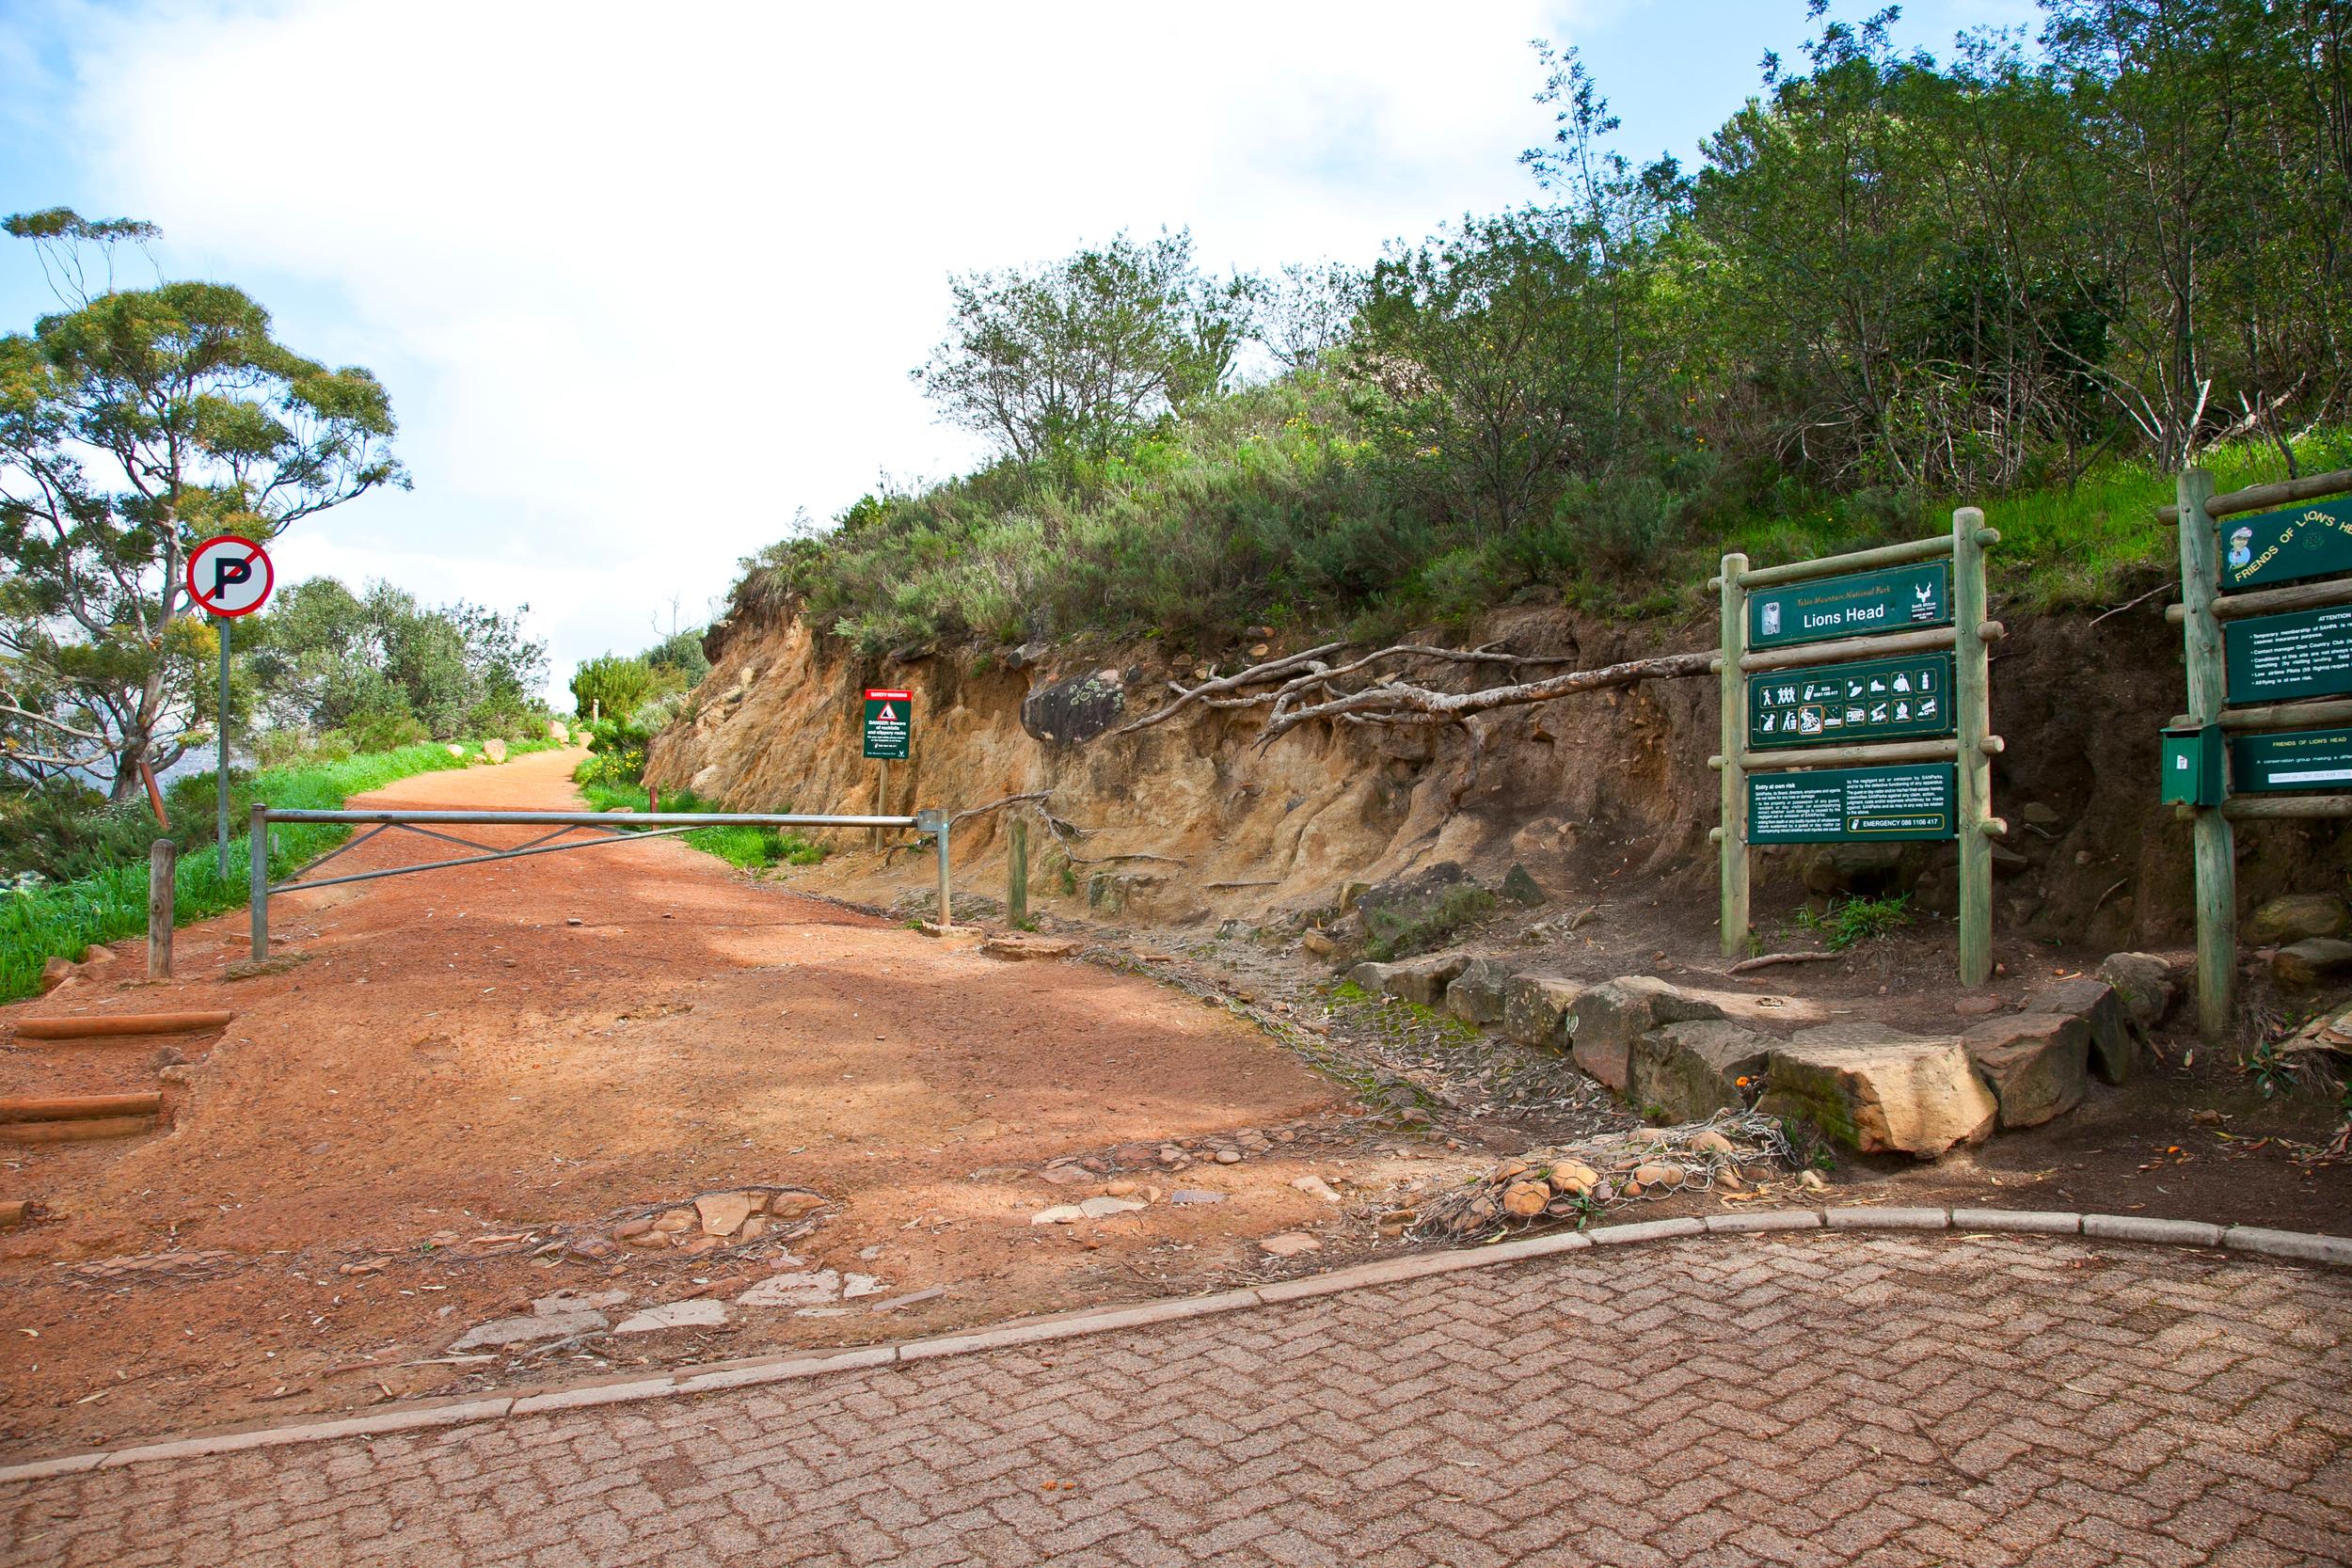 IMG_5006-hiking-lions-head-cape-town-trisa-taro.jpg